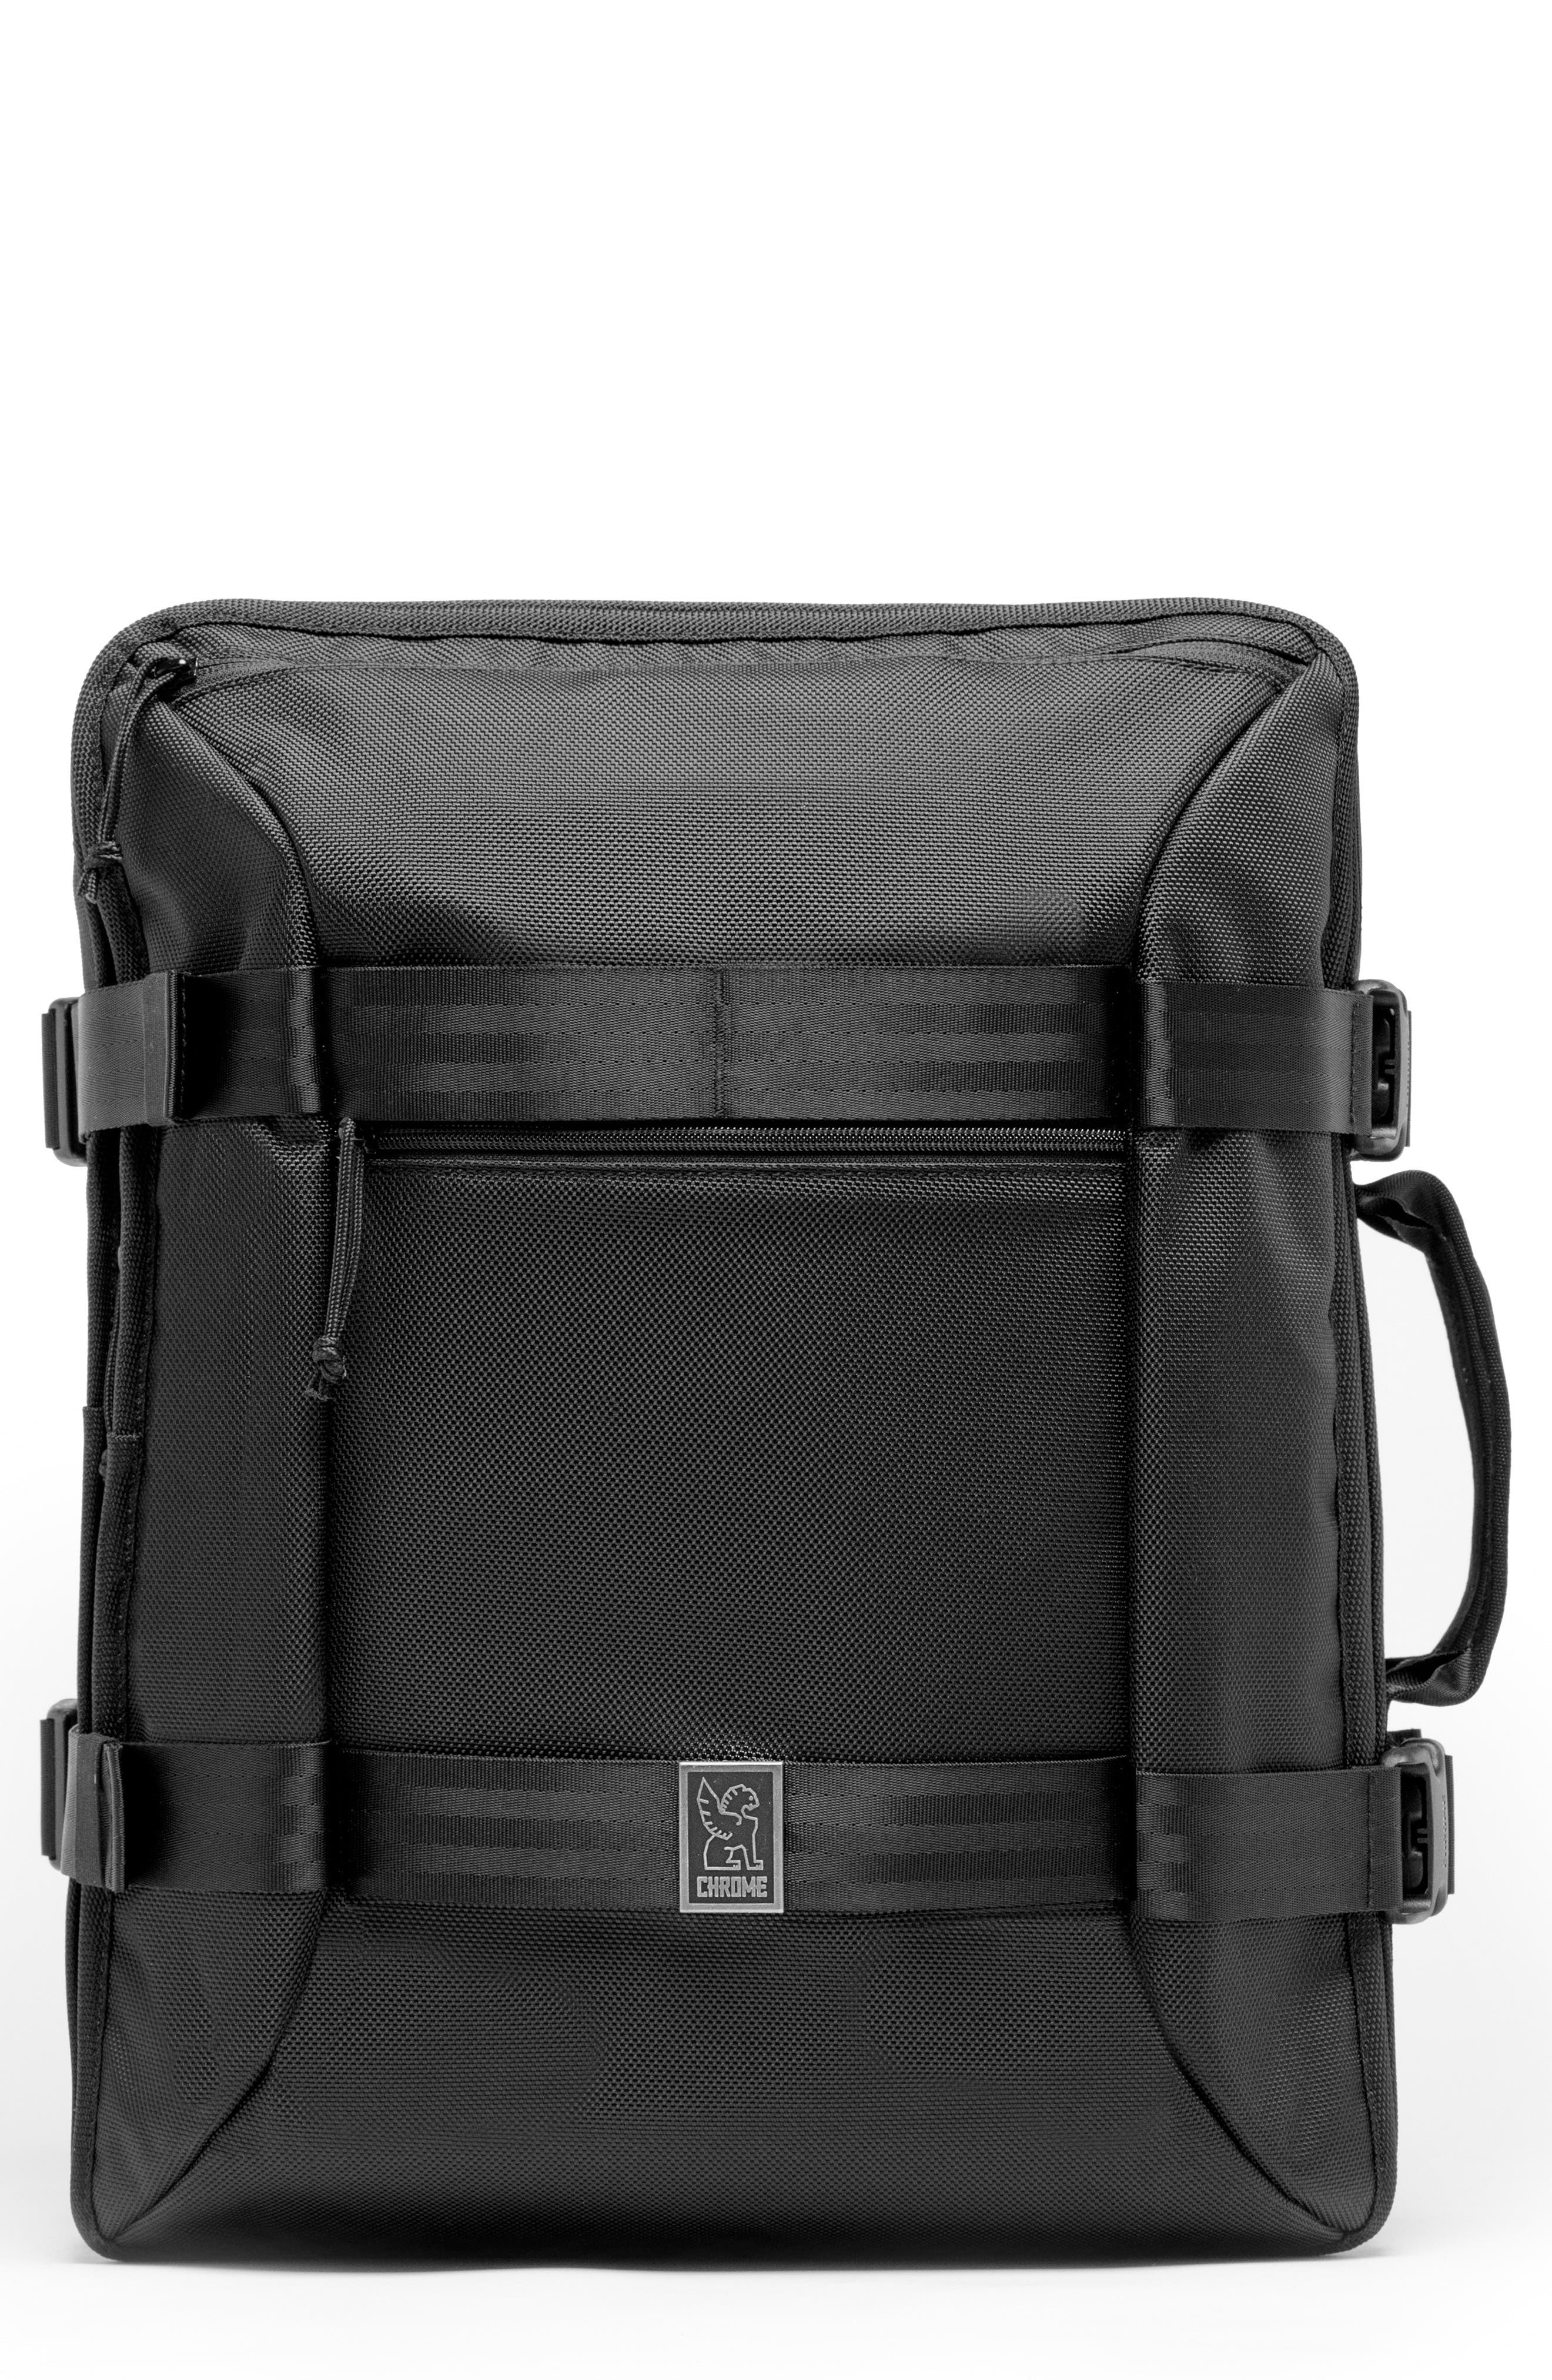 Macheto Travel Backpack,                             Main thumbnail 1, color,                             ALL BLACK